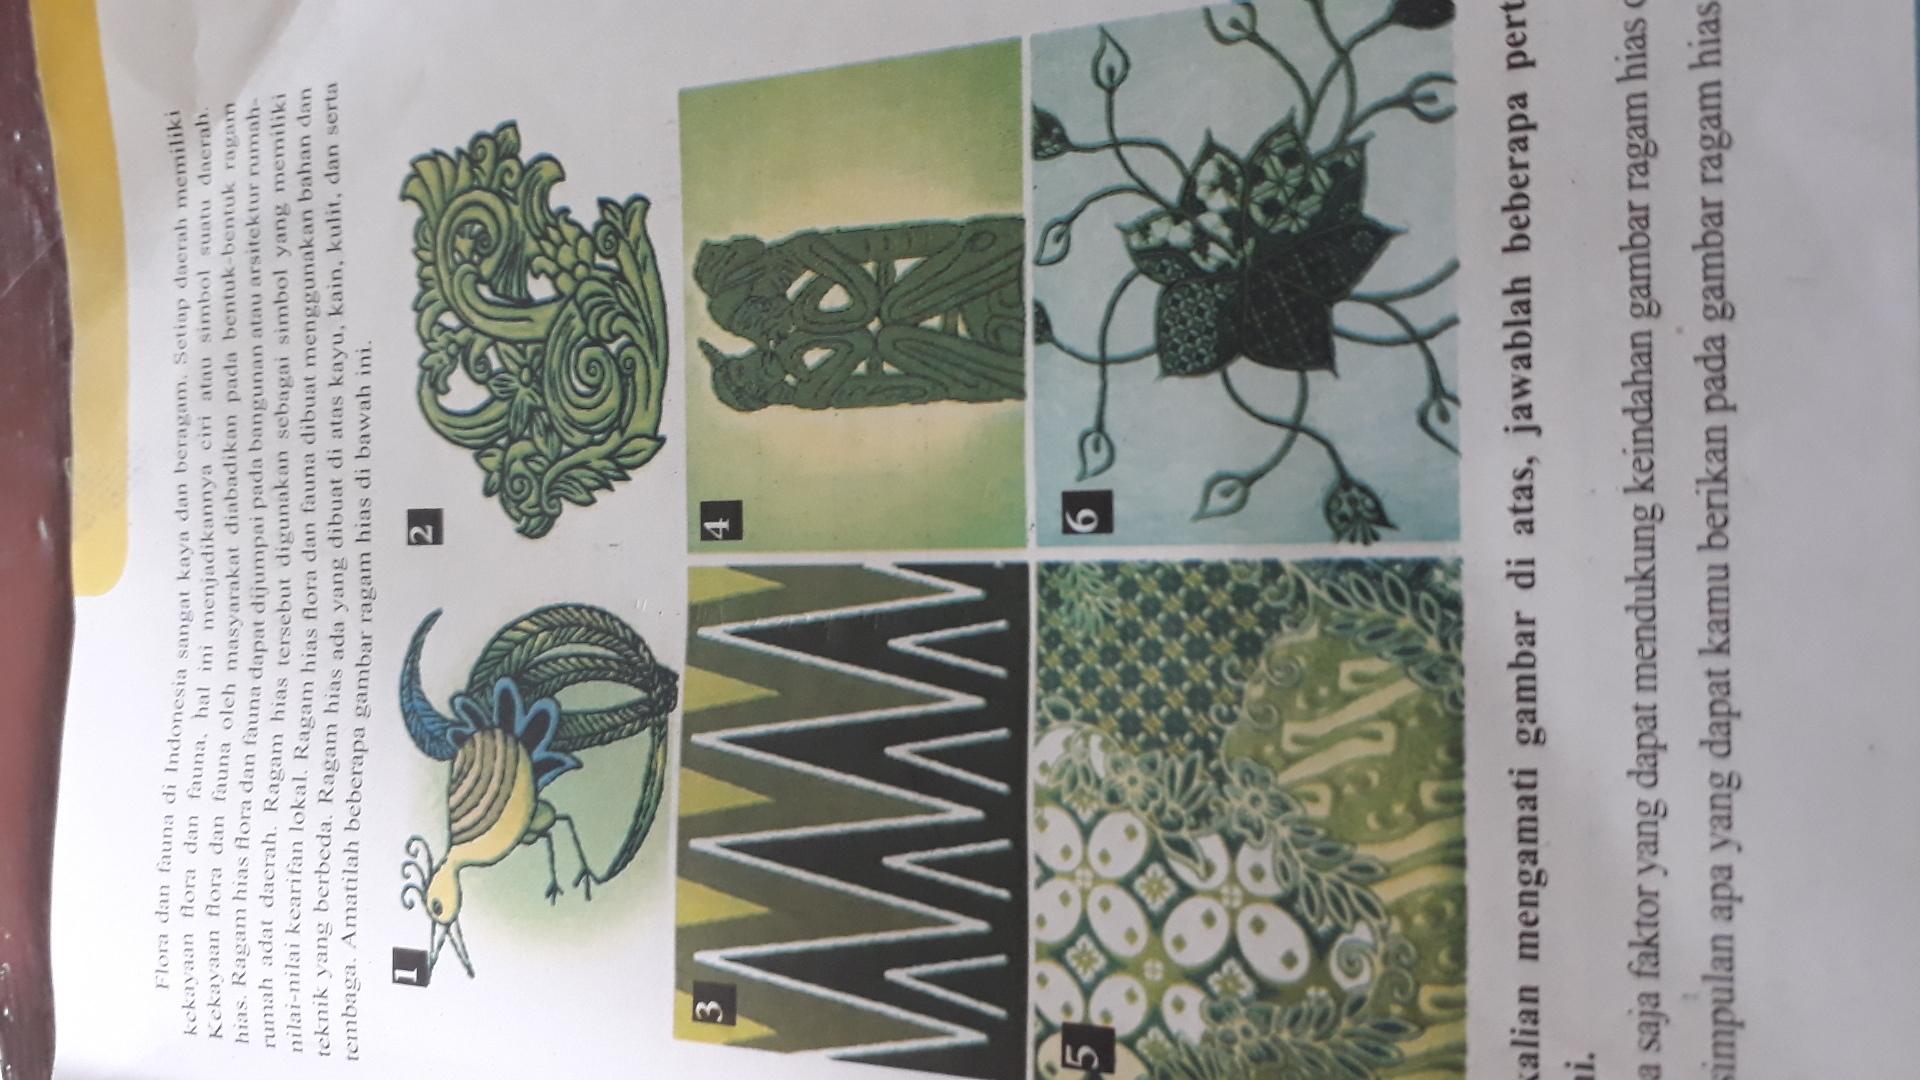 Menggambar Ragam Hias Figuratif Geometris Fauna Flora Dan Motif